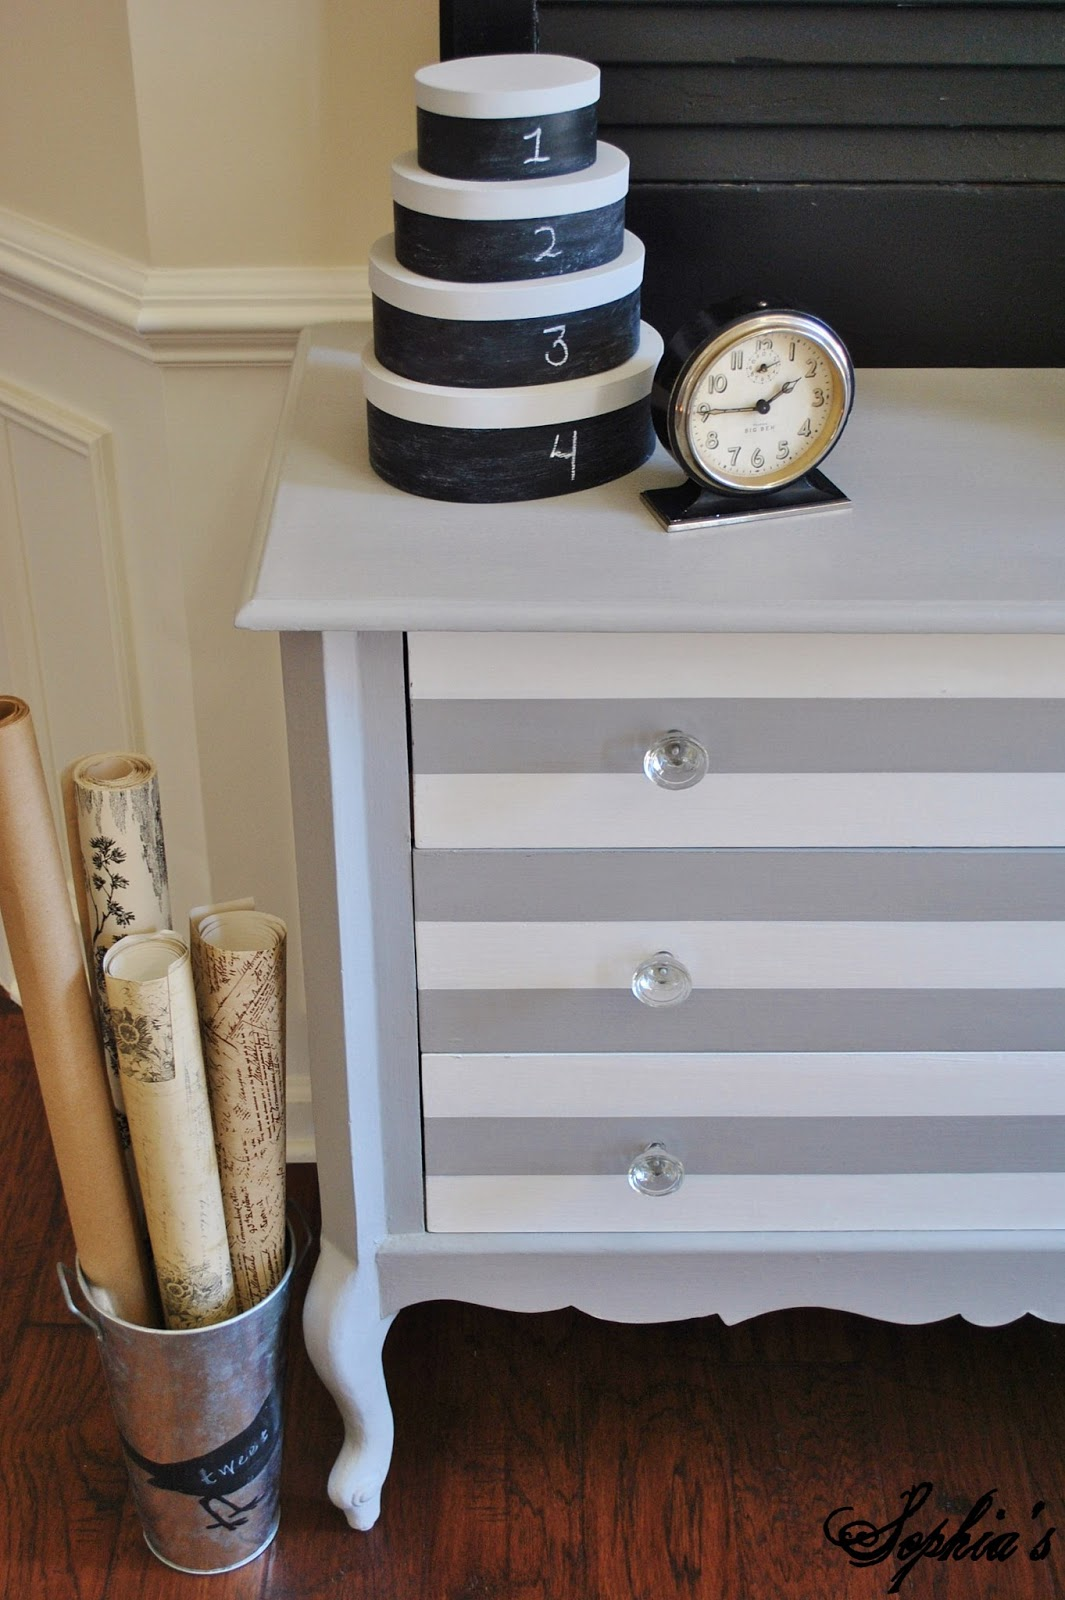 Excellent Sophia's: Paris Grey & White Striped Dresser RF64